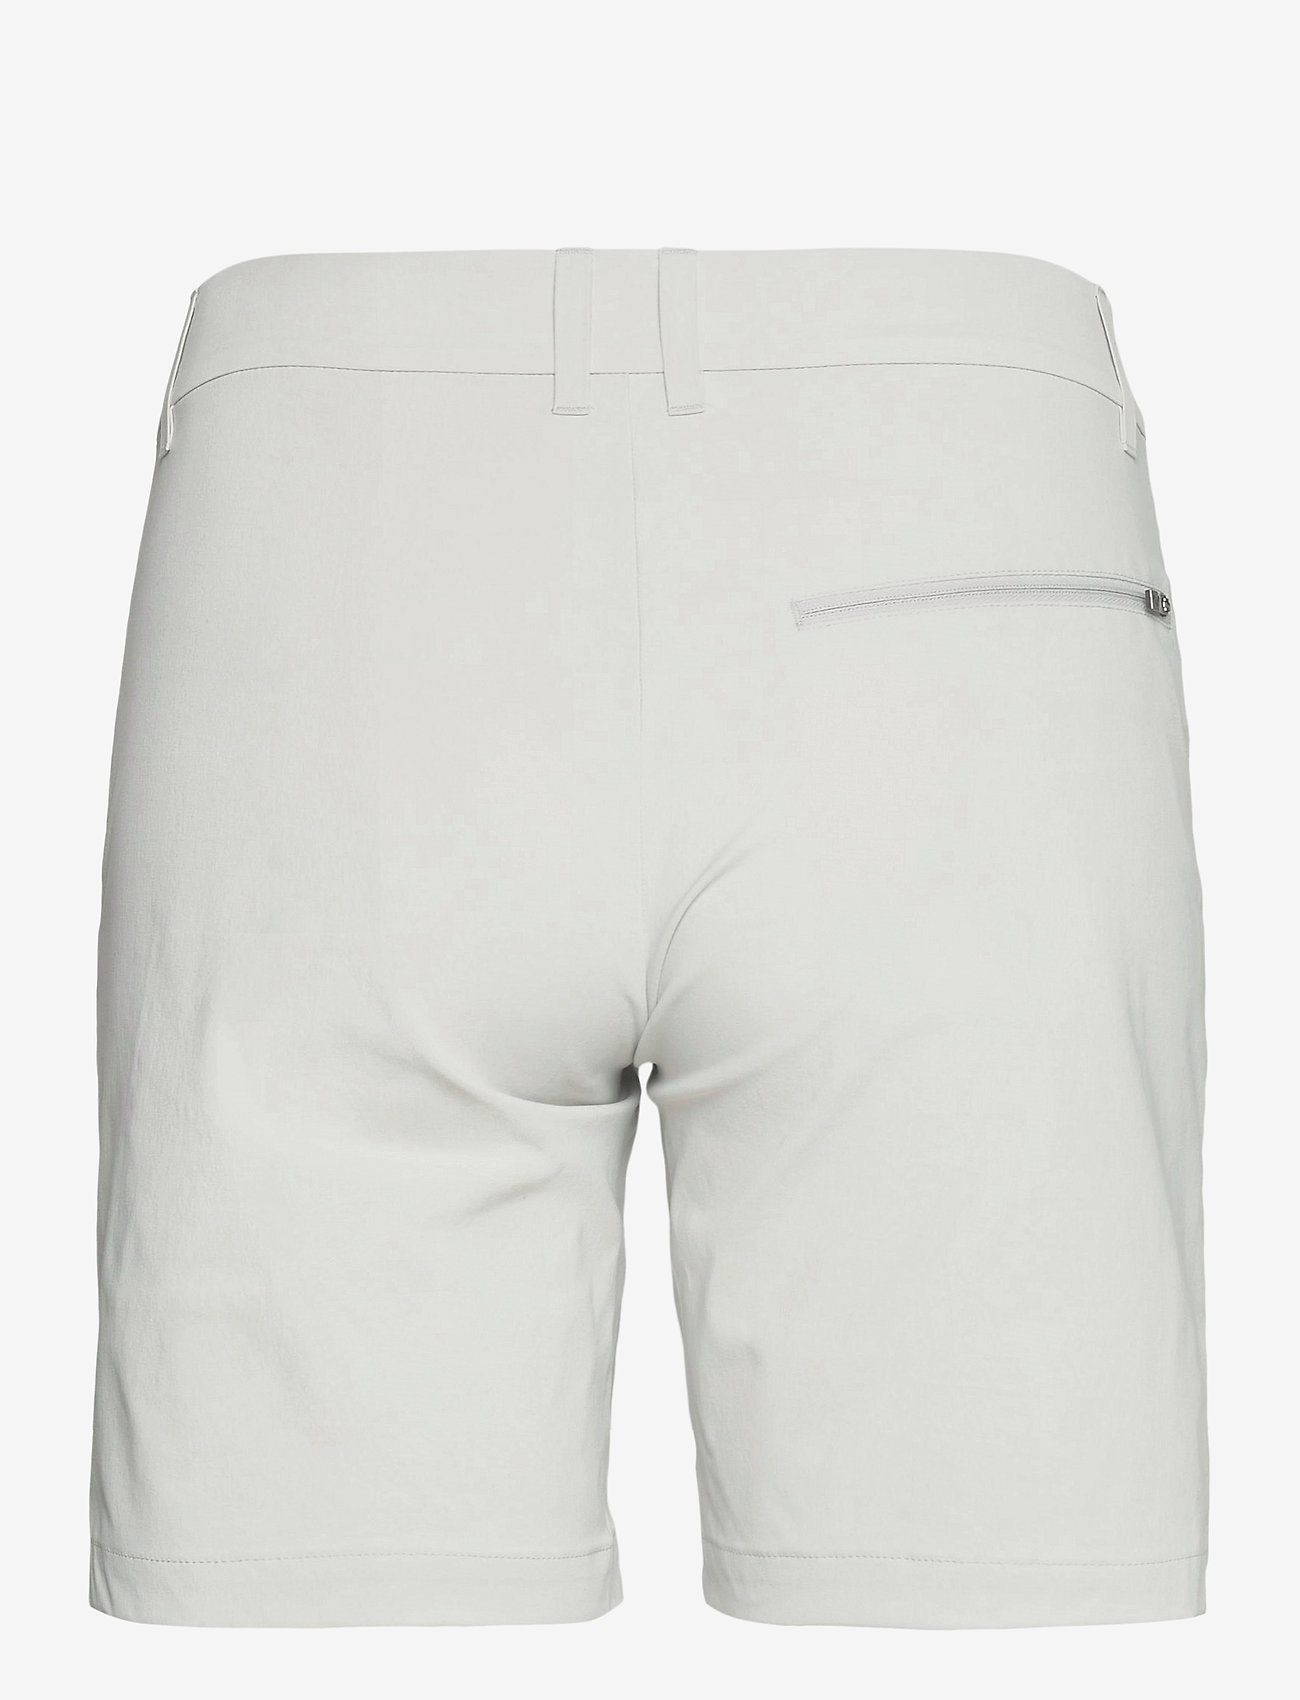 Peak Performance - W Illusion Shorts - wandel korte broek - antarctica - 1